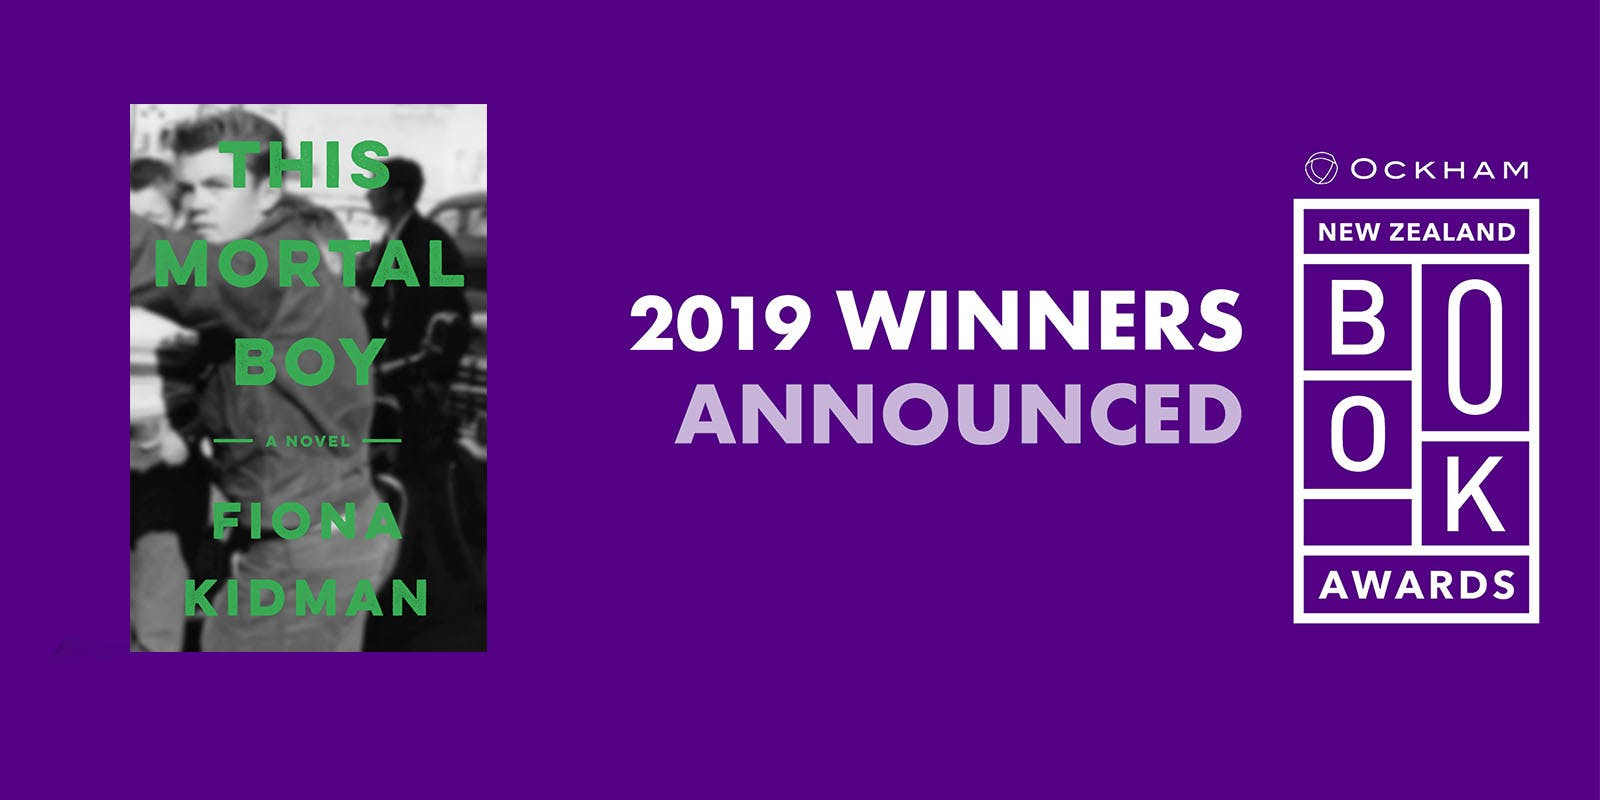 This Mortal Boy wins Ockham New Zealand Book Award